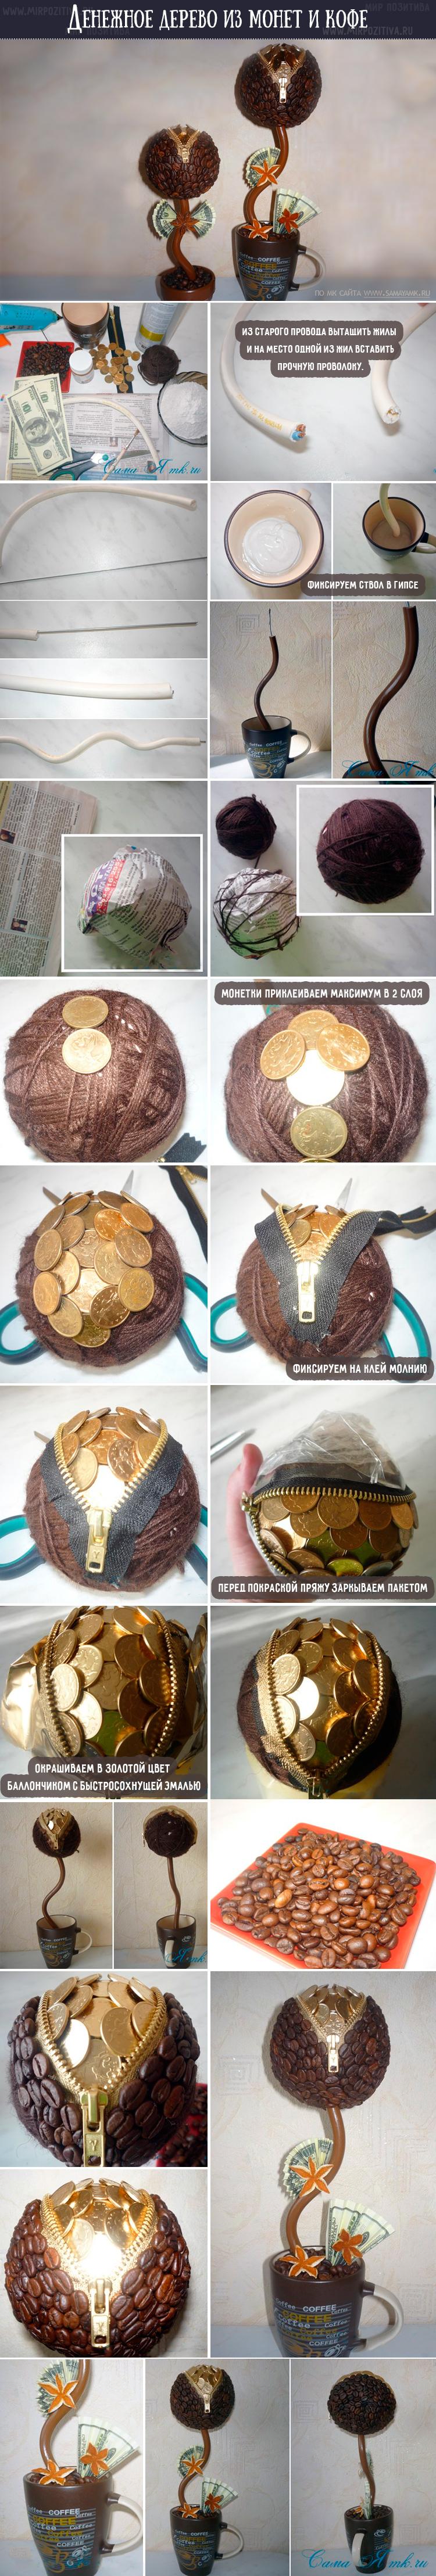 топиарий из кофе монет и молнии